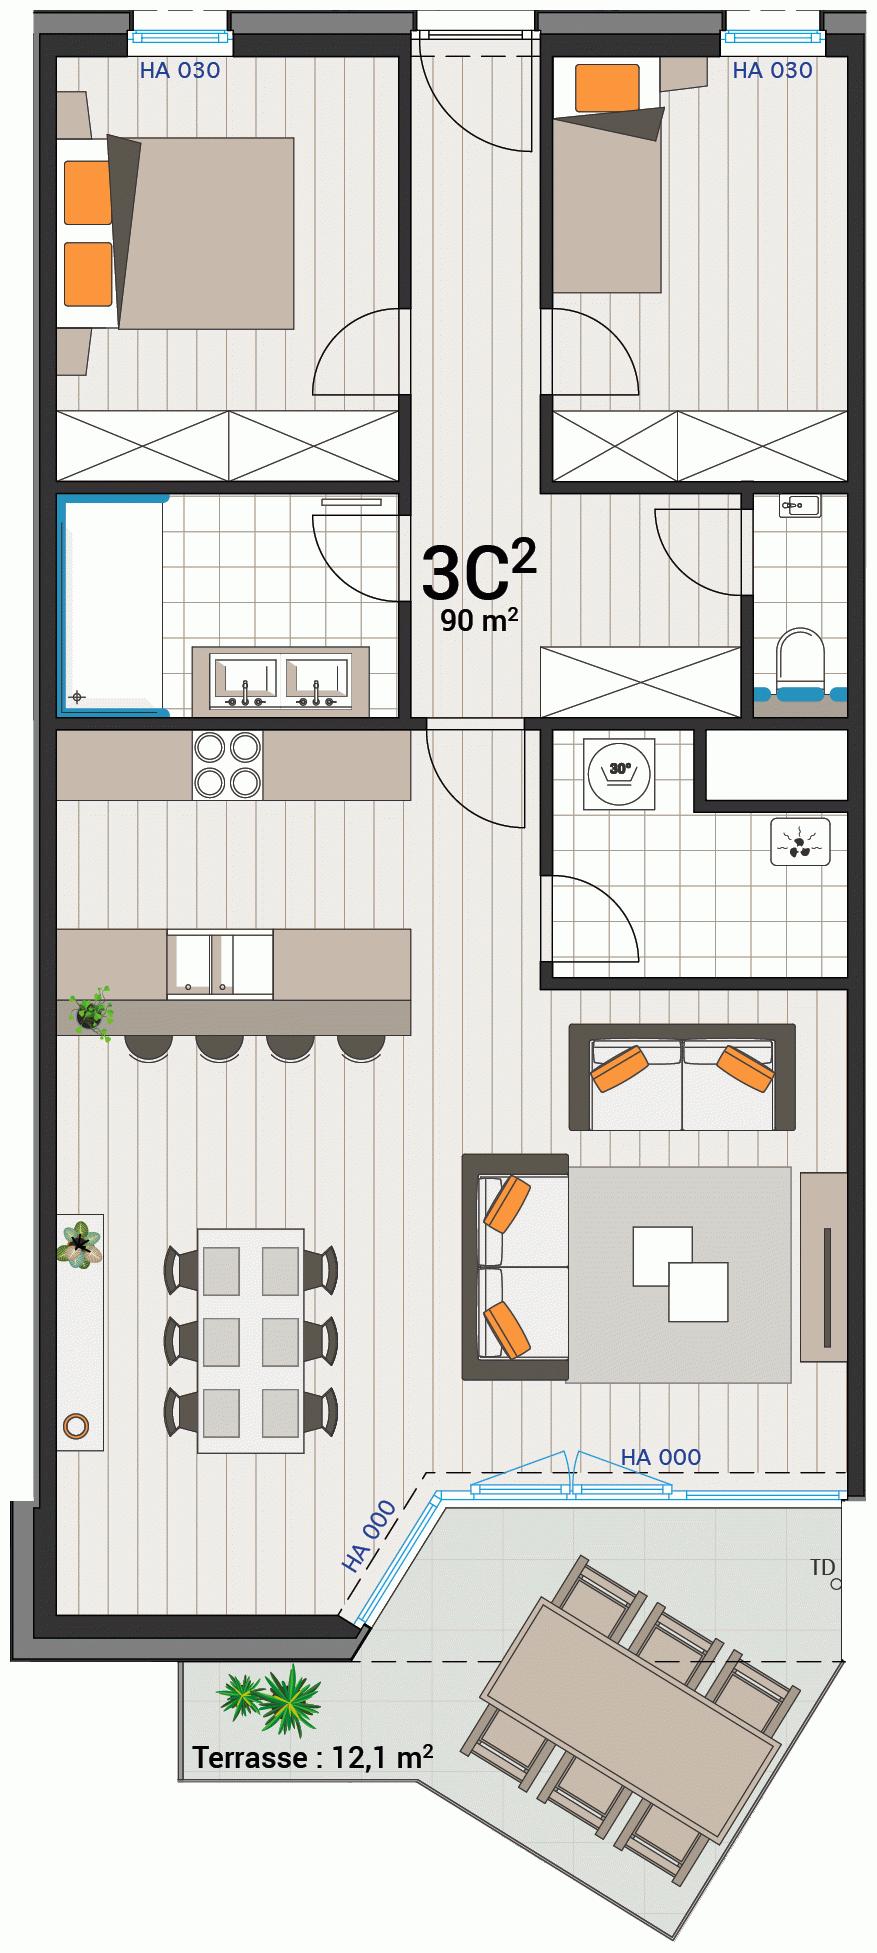 Appartement 3C